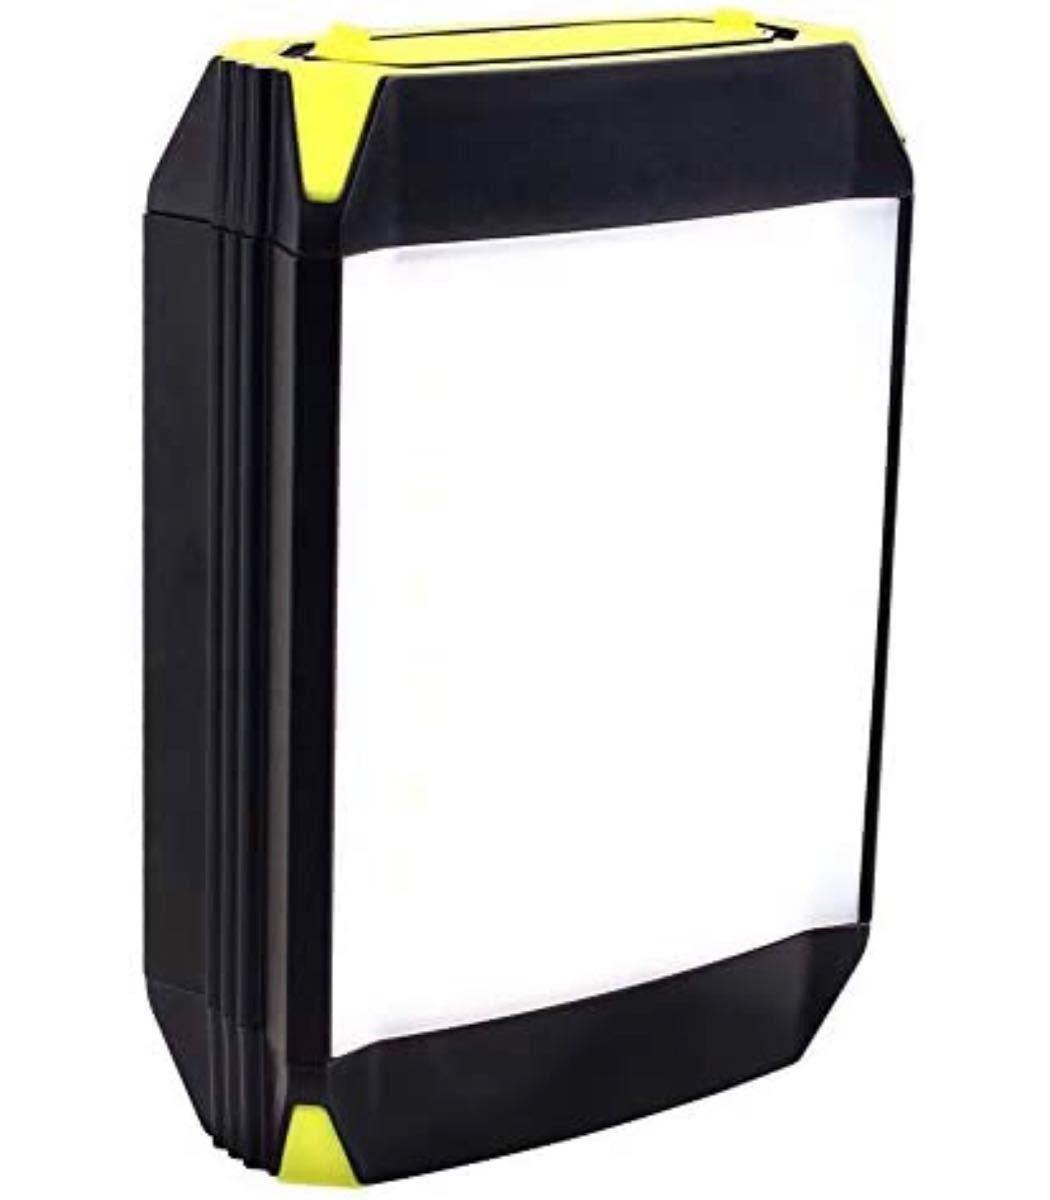 LEDランタン キャンプライト LED投光器 6000mAhモバイルバッテリー 30led 明らかさ3段調整 2種類SOSモード